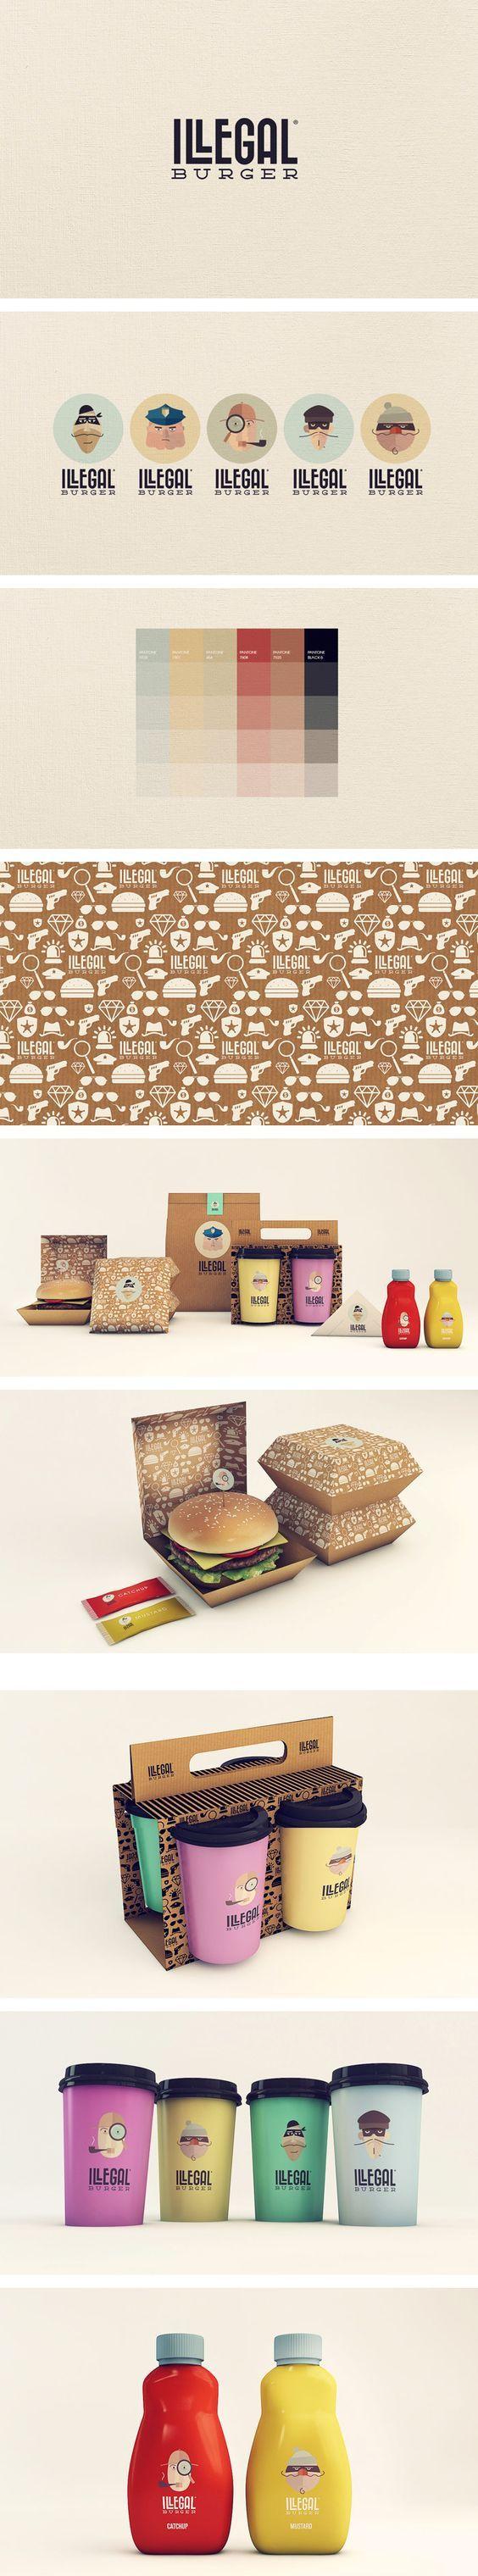 Illegal Burger - visual identity | Designer: Isabella Rodriguez/Sweety Branding Studio (variações do logo):